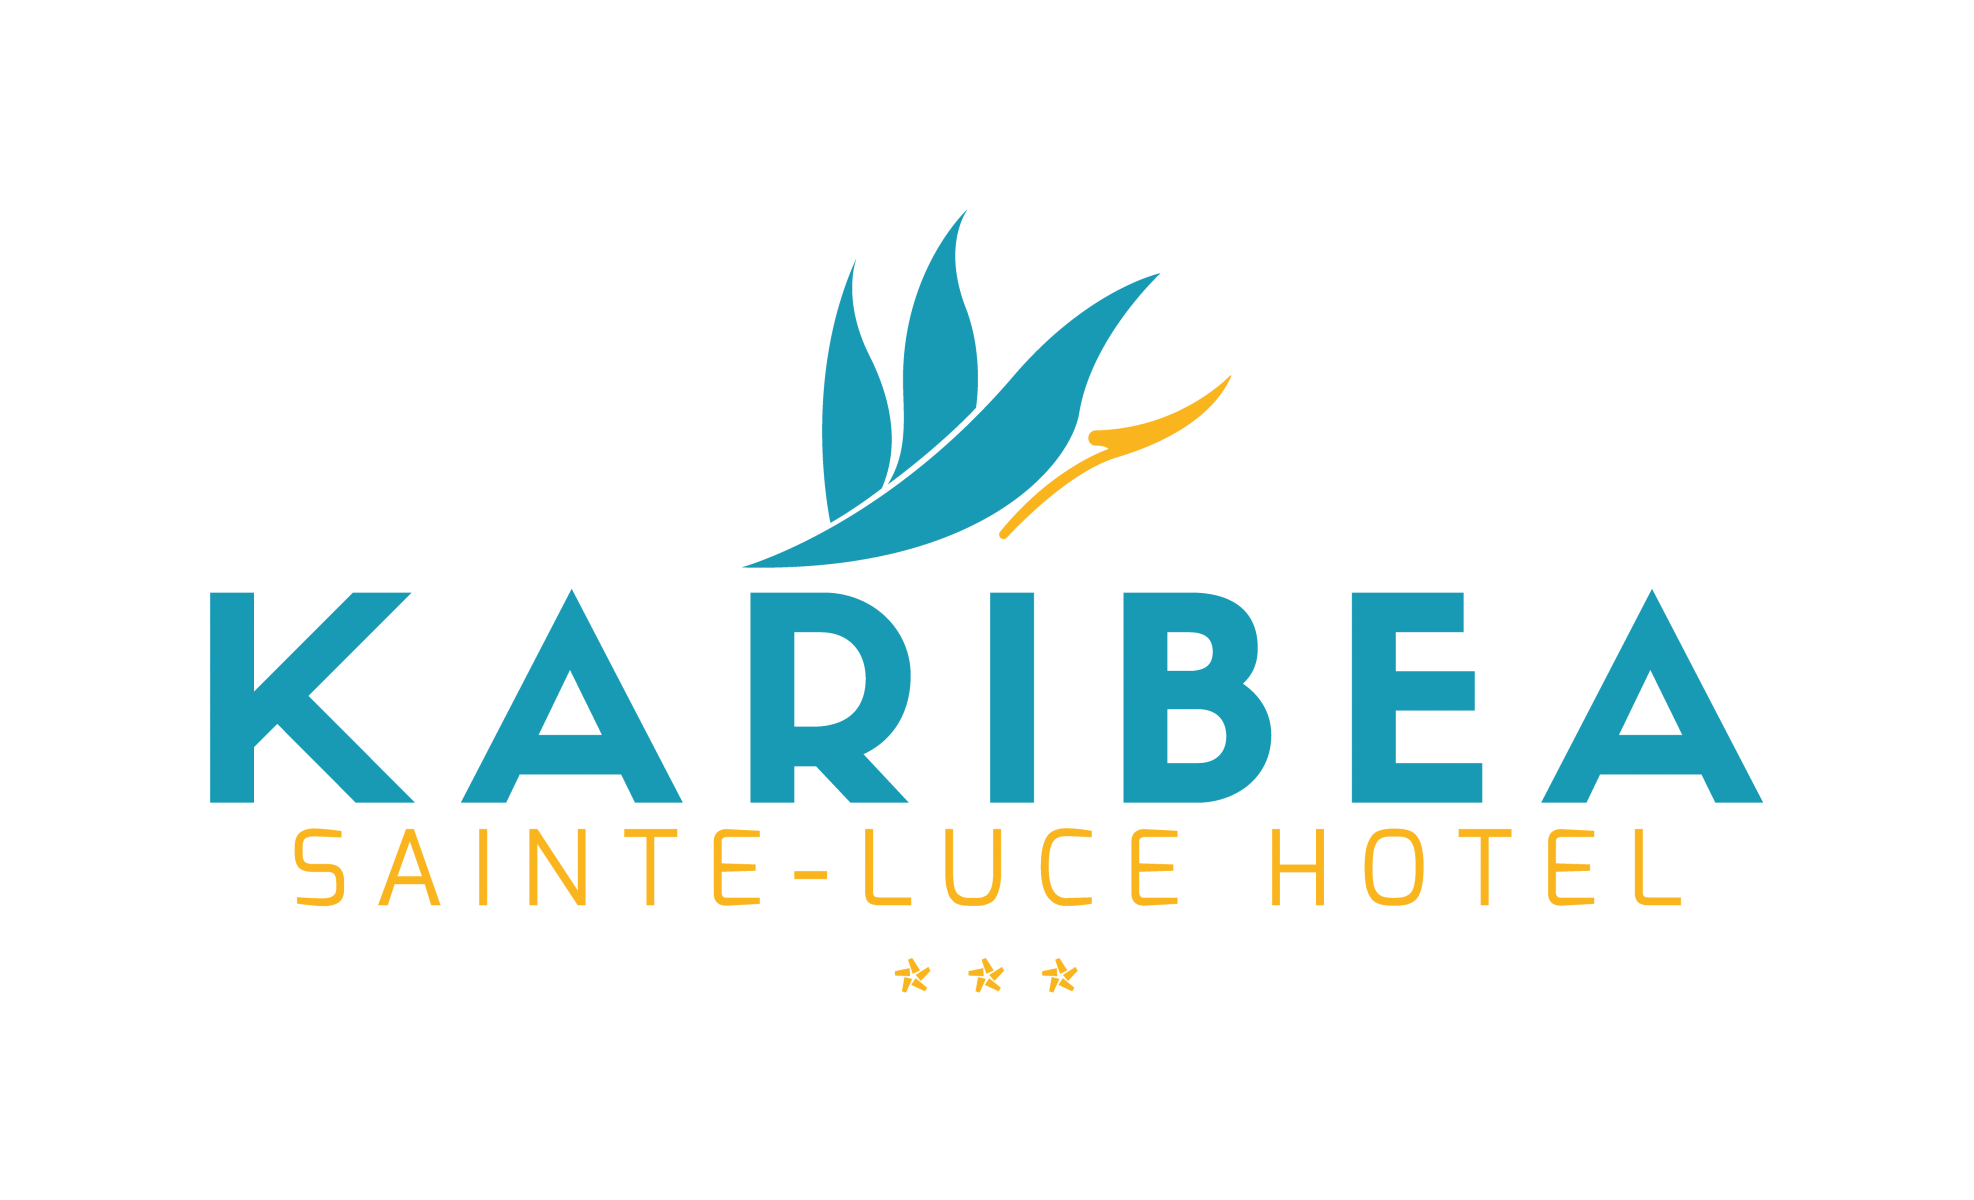 Karibea Sainte Luce Hotel